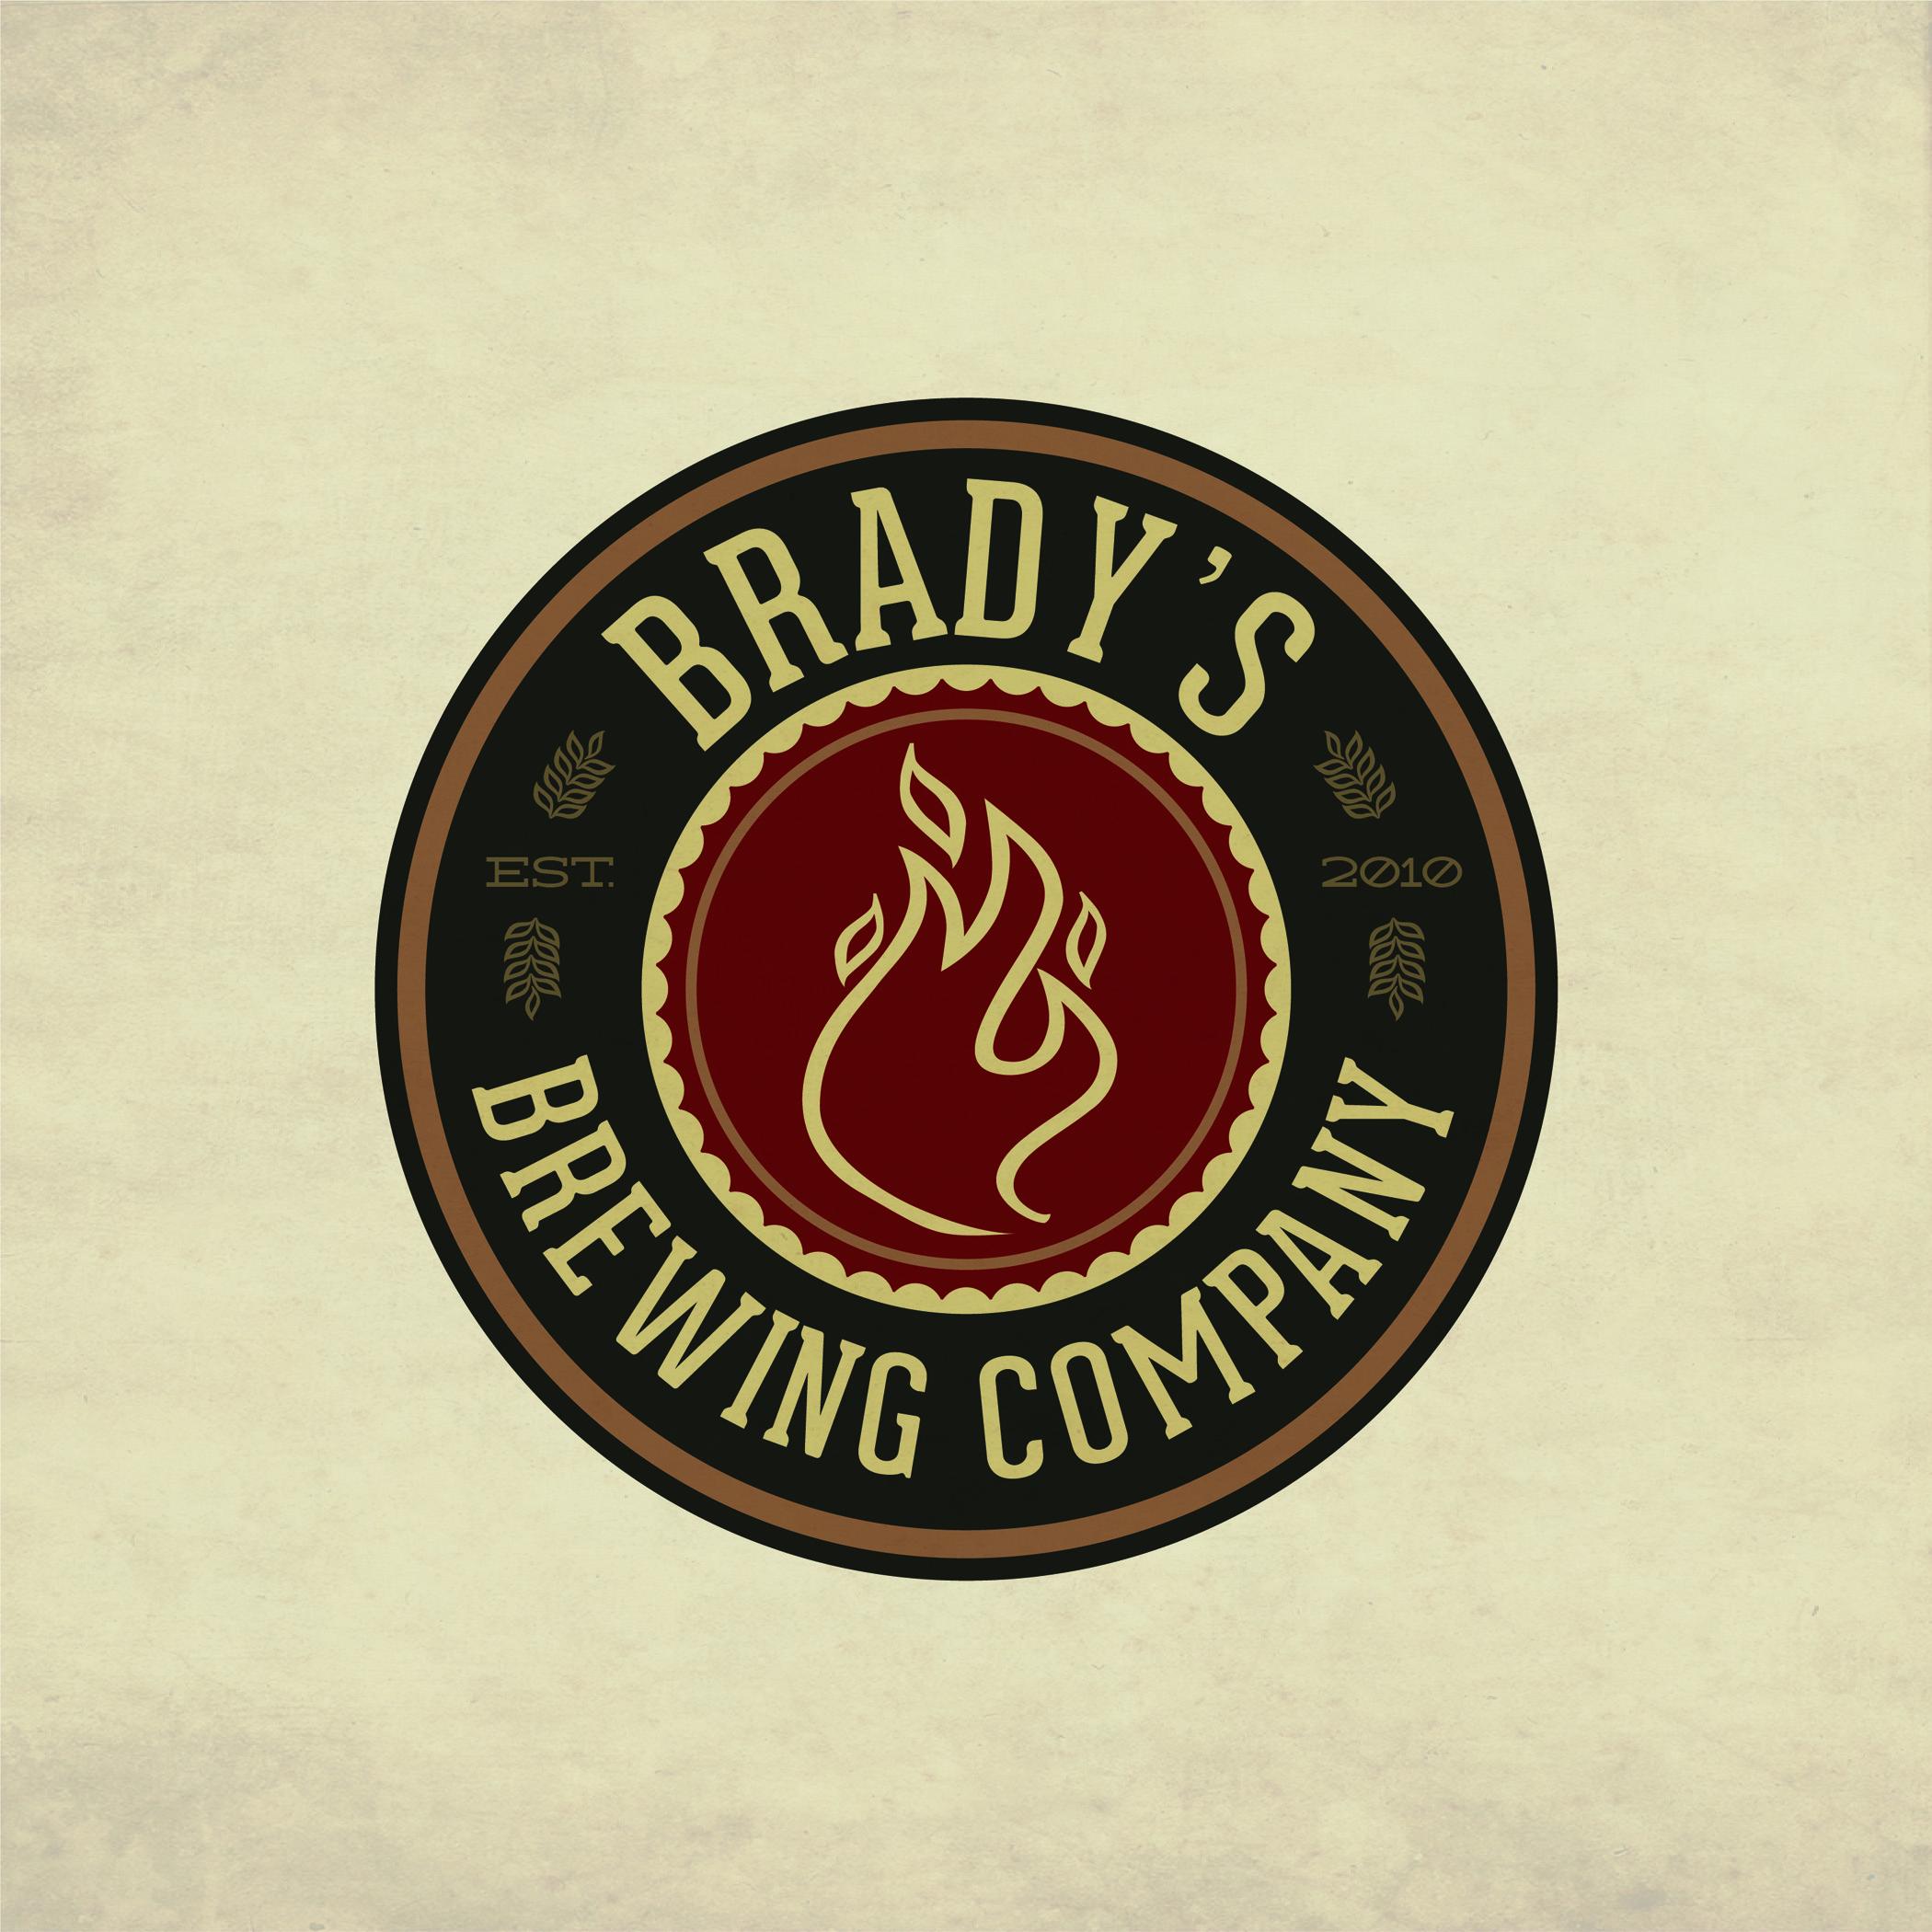 BradysBrewingCo_LogoFinal_Light.jpg